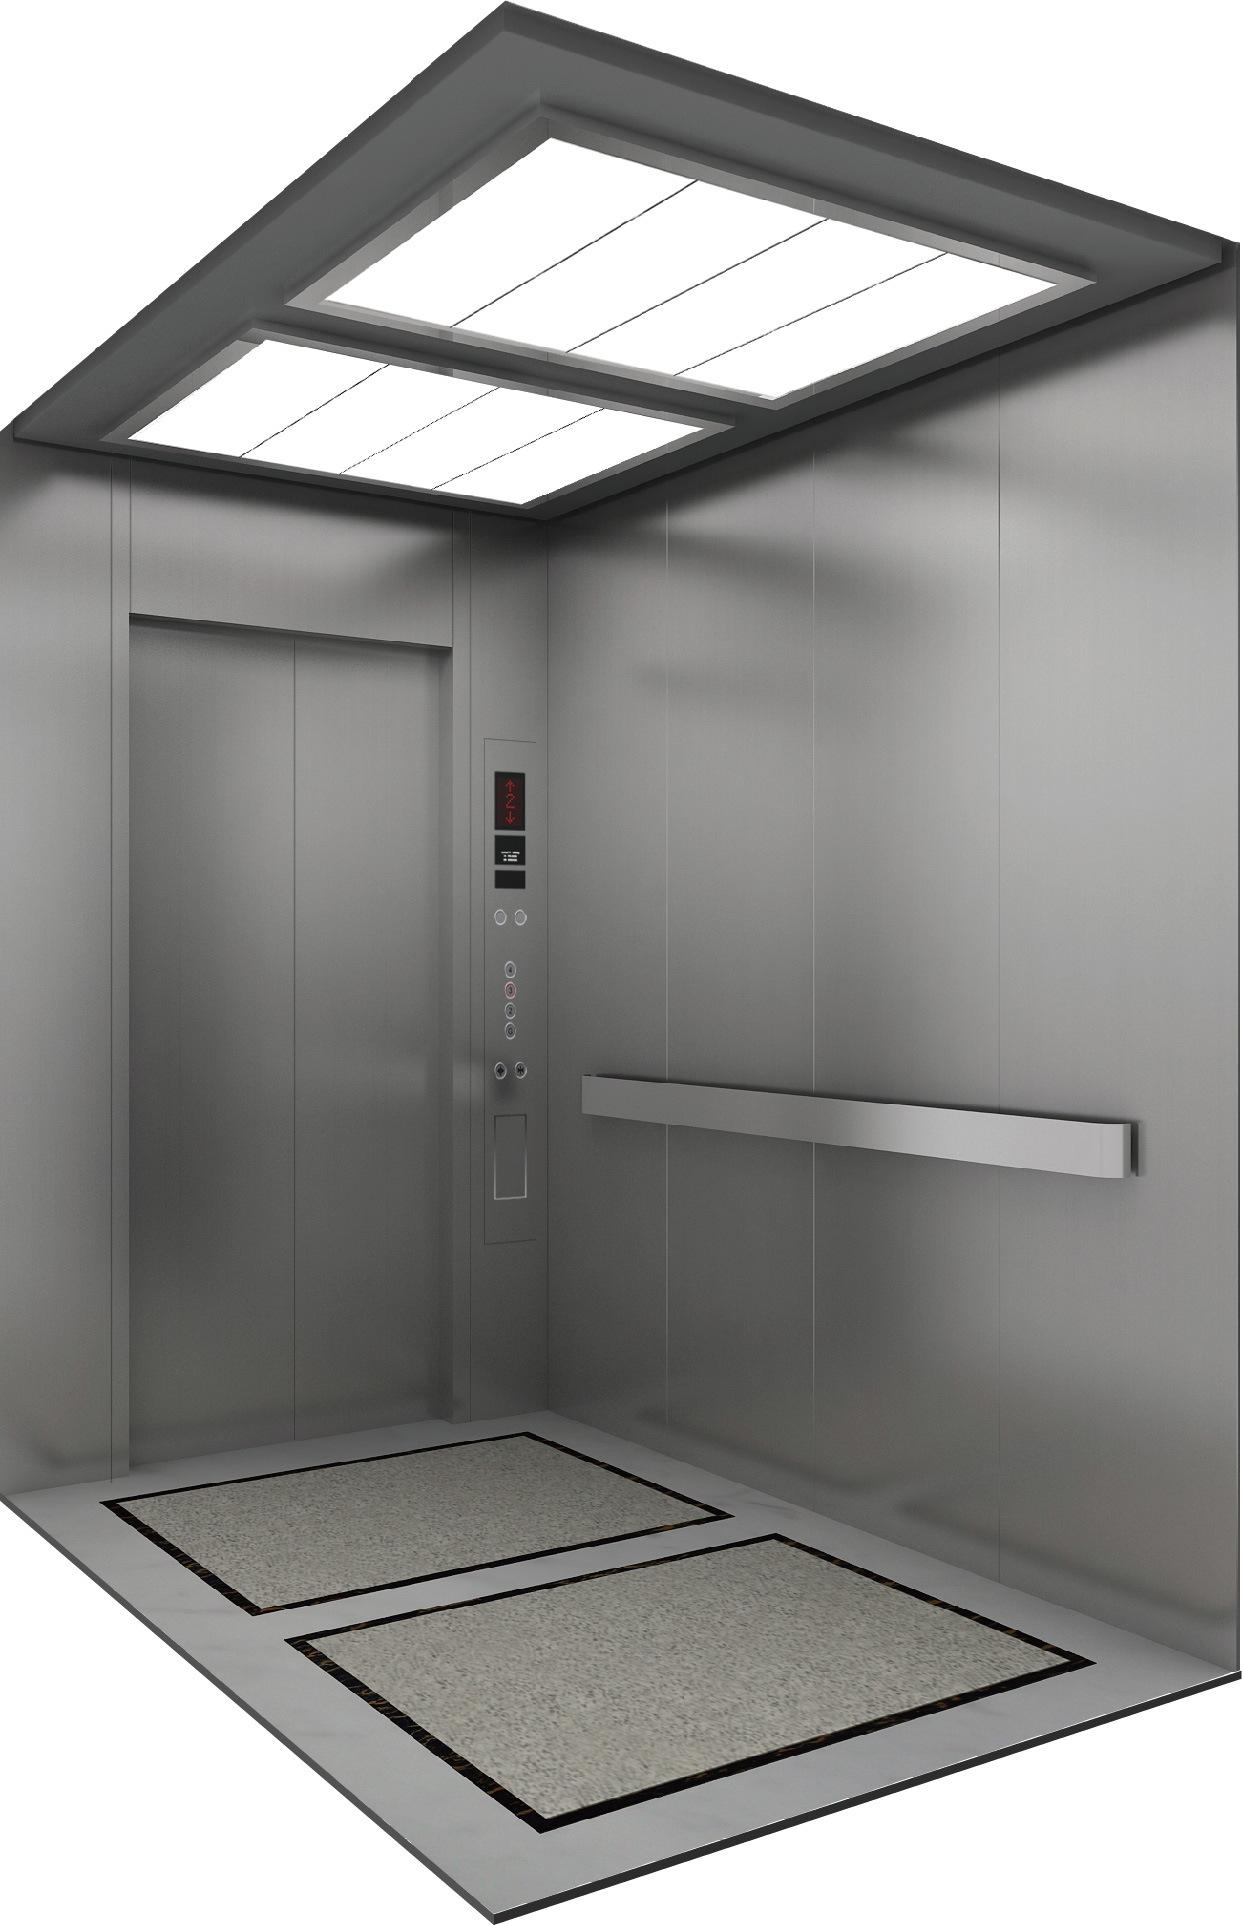 China Machine Roomless 13 Passenger Elevator 1250kg Lift